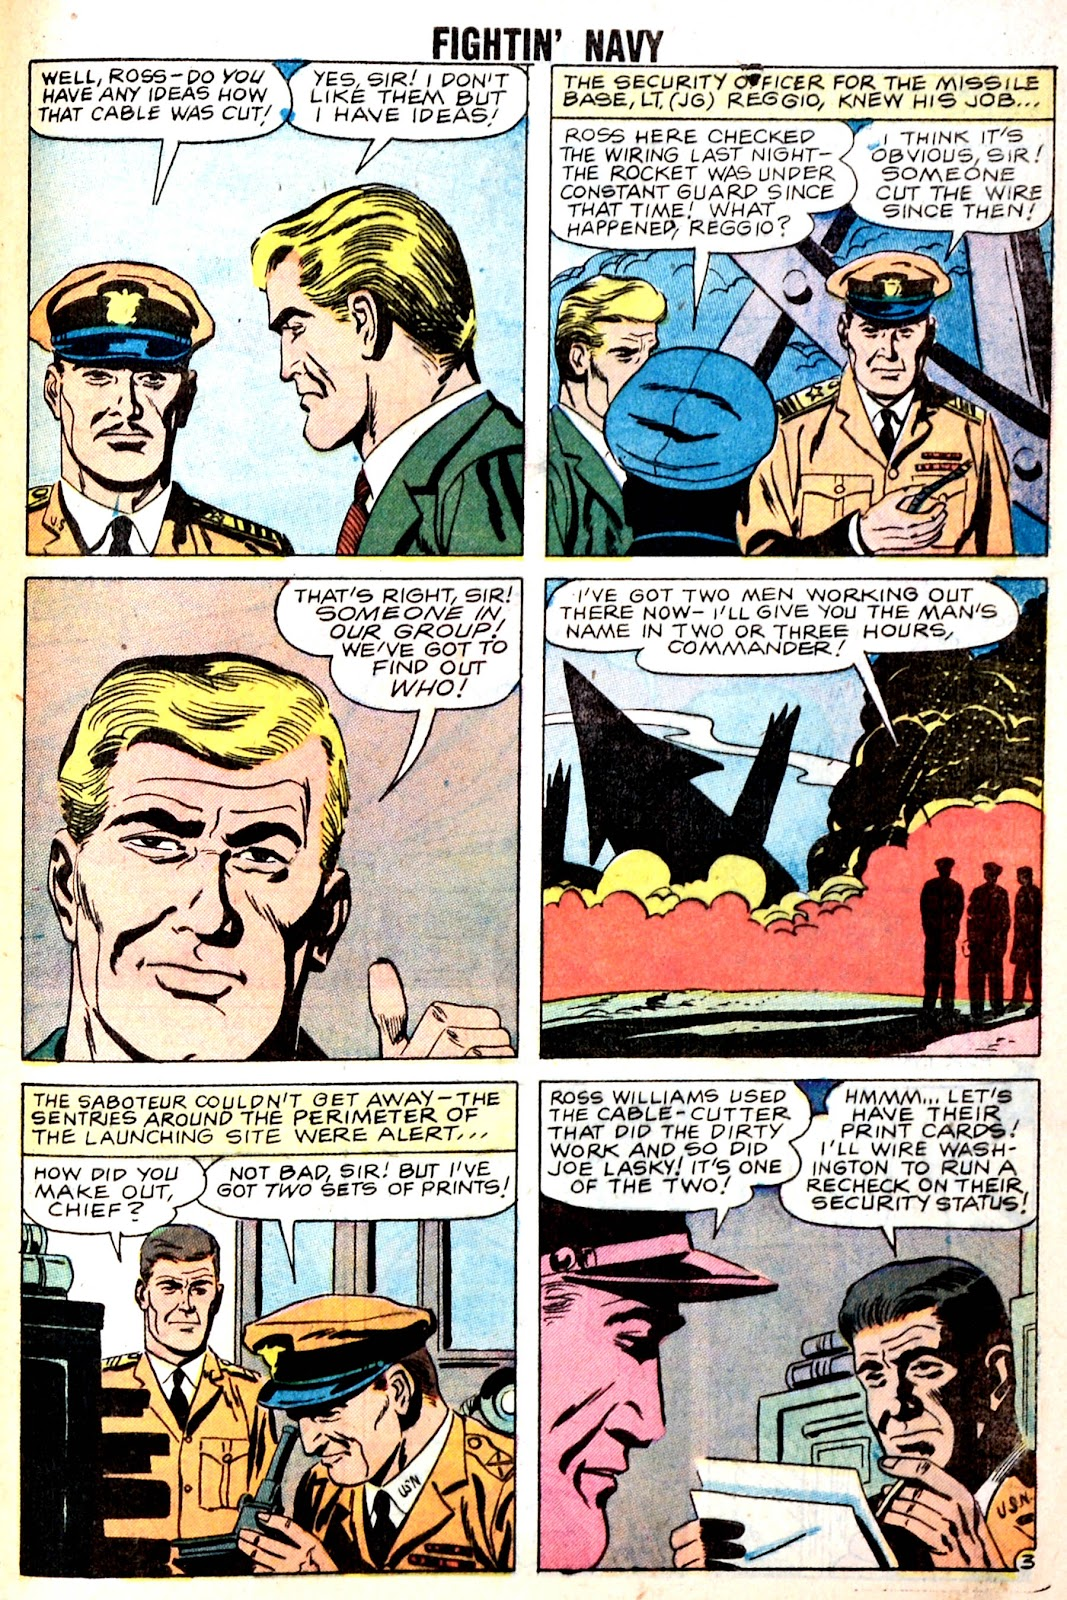 Read online Fightin' Navy comic -  Issue #85 - 29